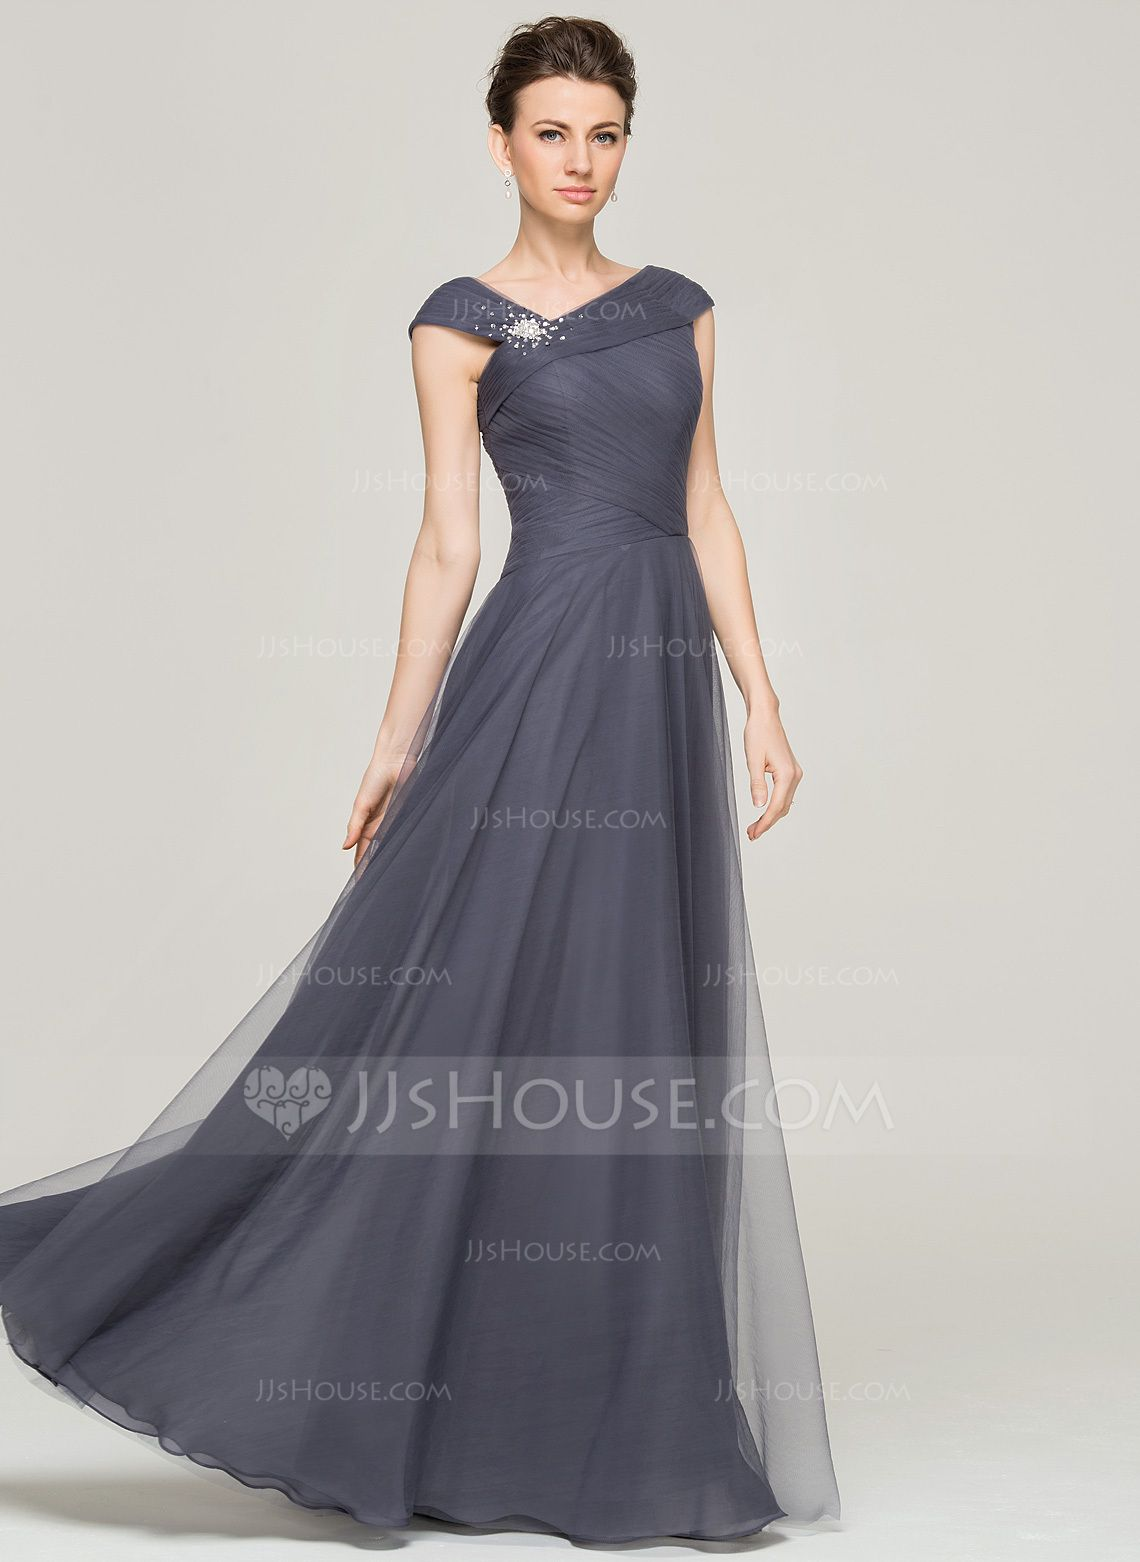 Mother of the bride dresses evening wedding  ALinePrincess Vneck FloorLength Tulle Mother of the Bride Dress